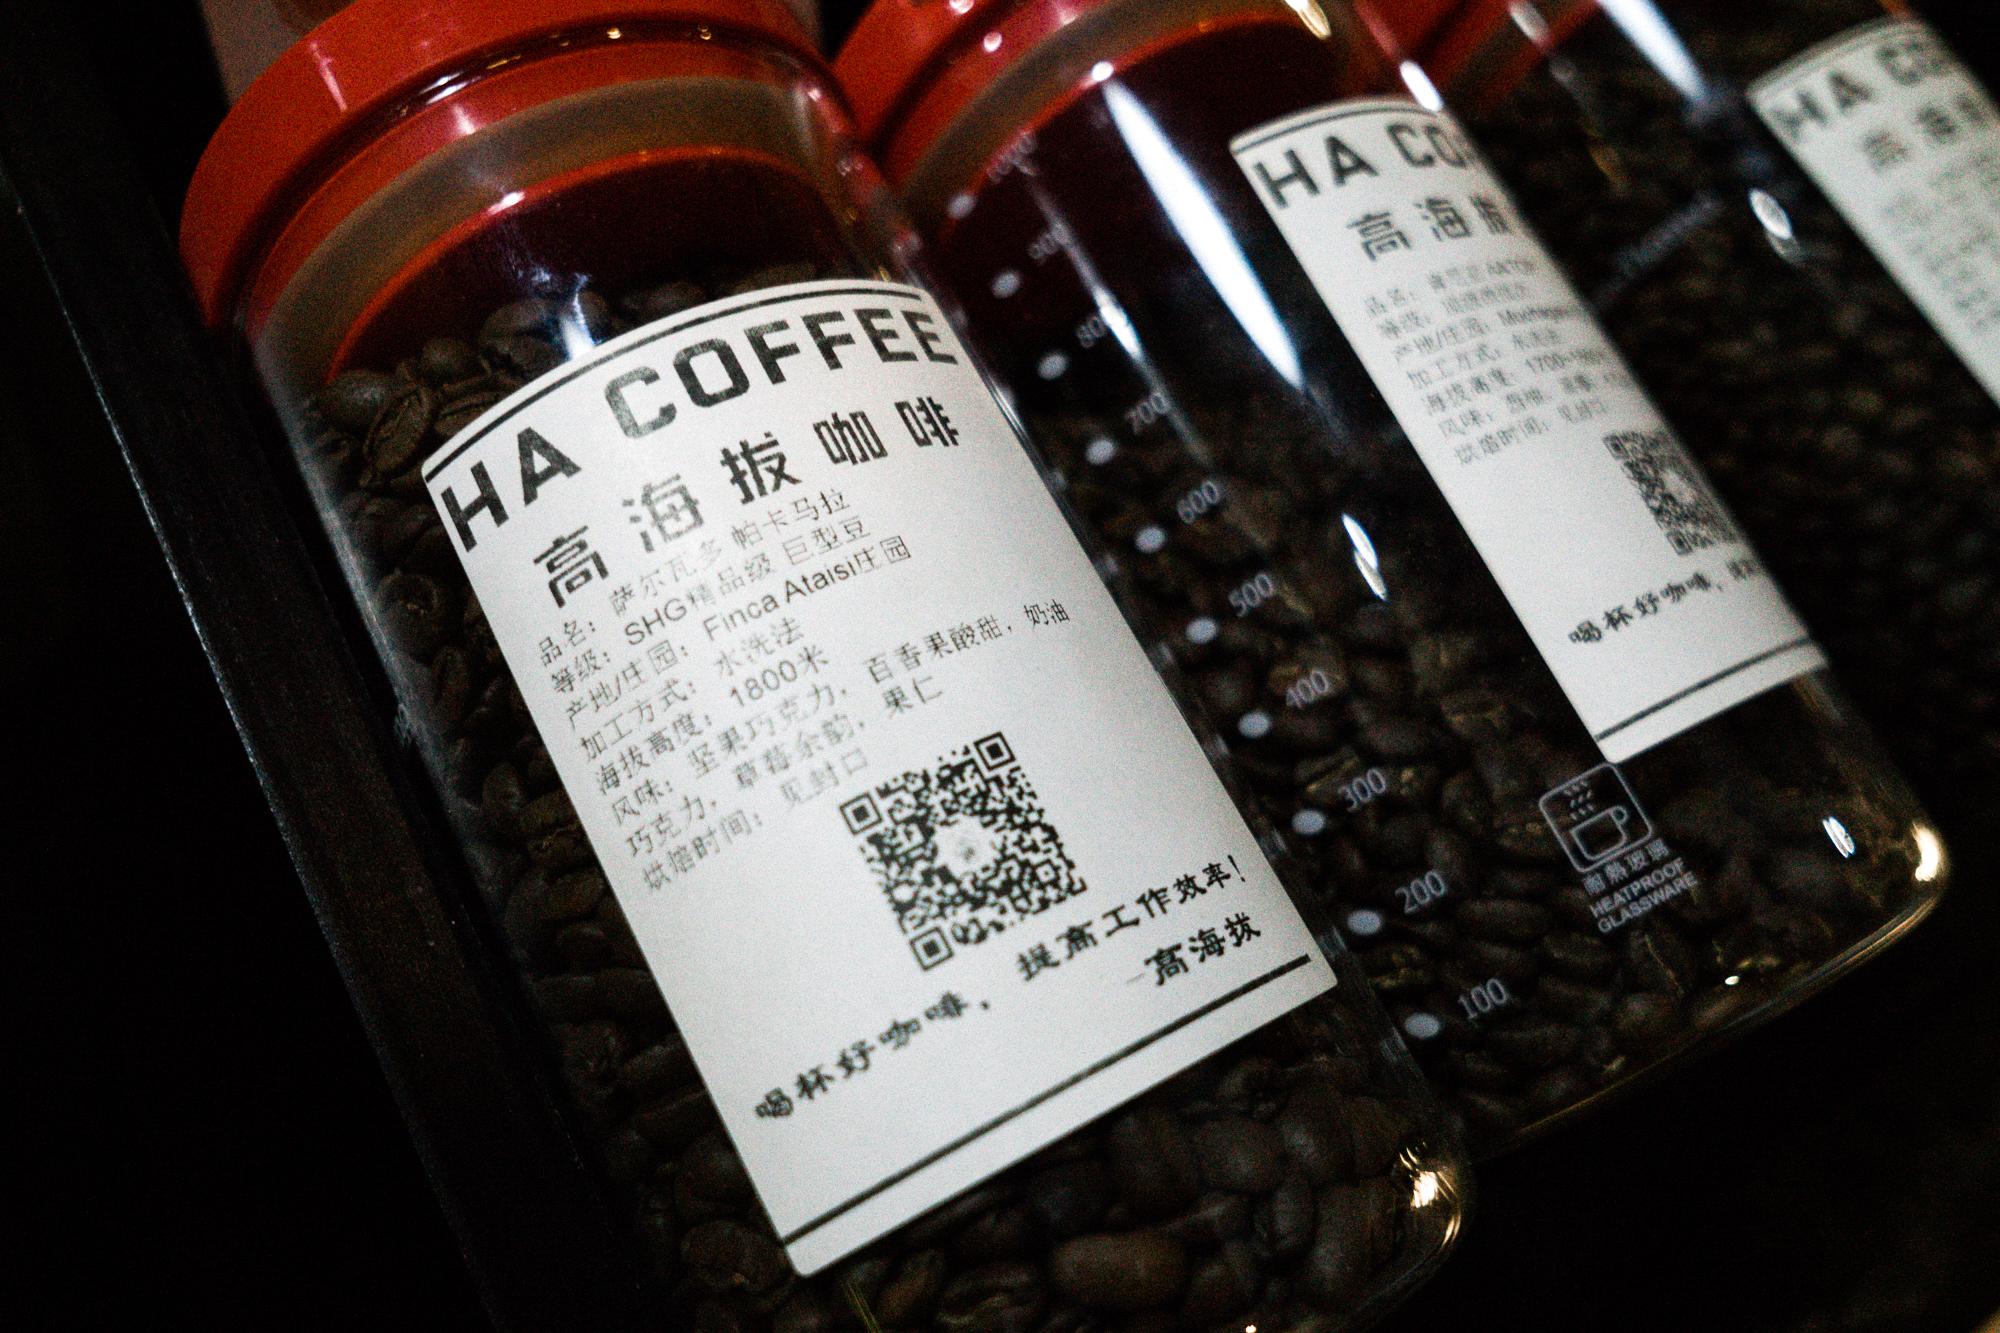 HIGH ALTITUDE COFFEE BEIJING CHINA